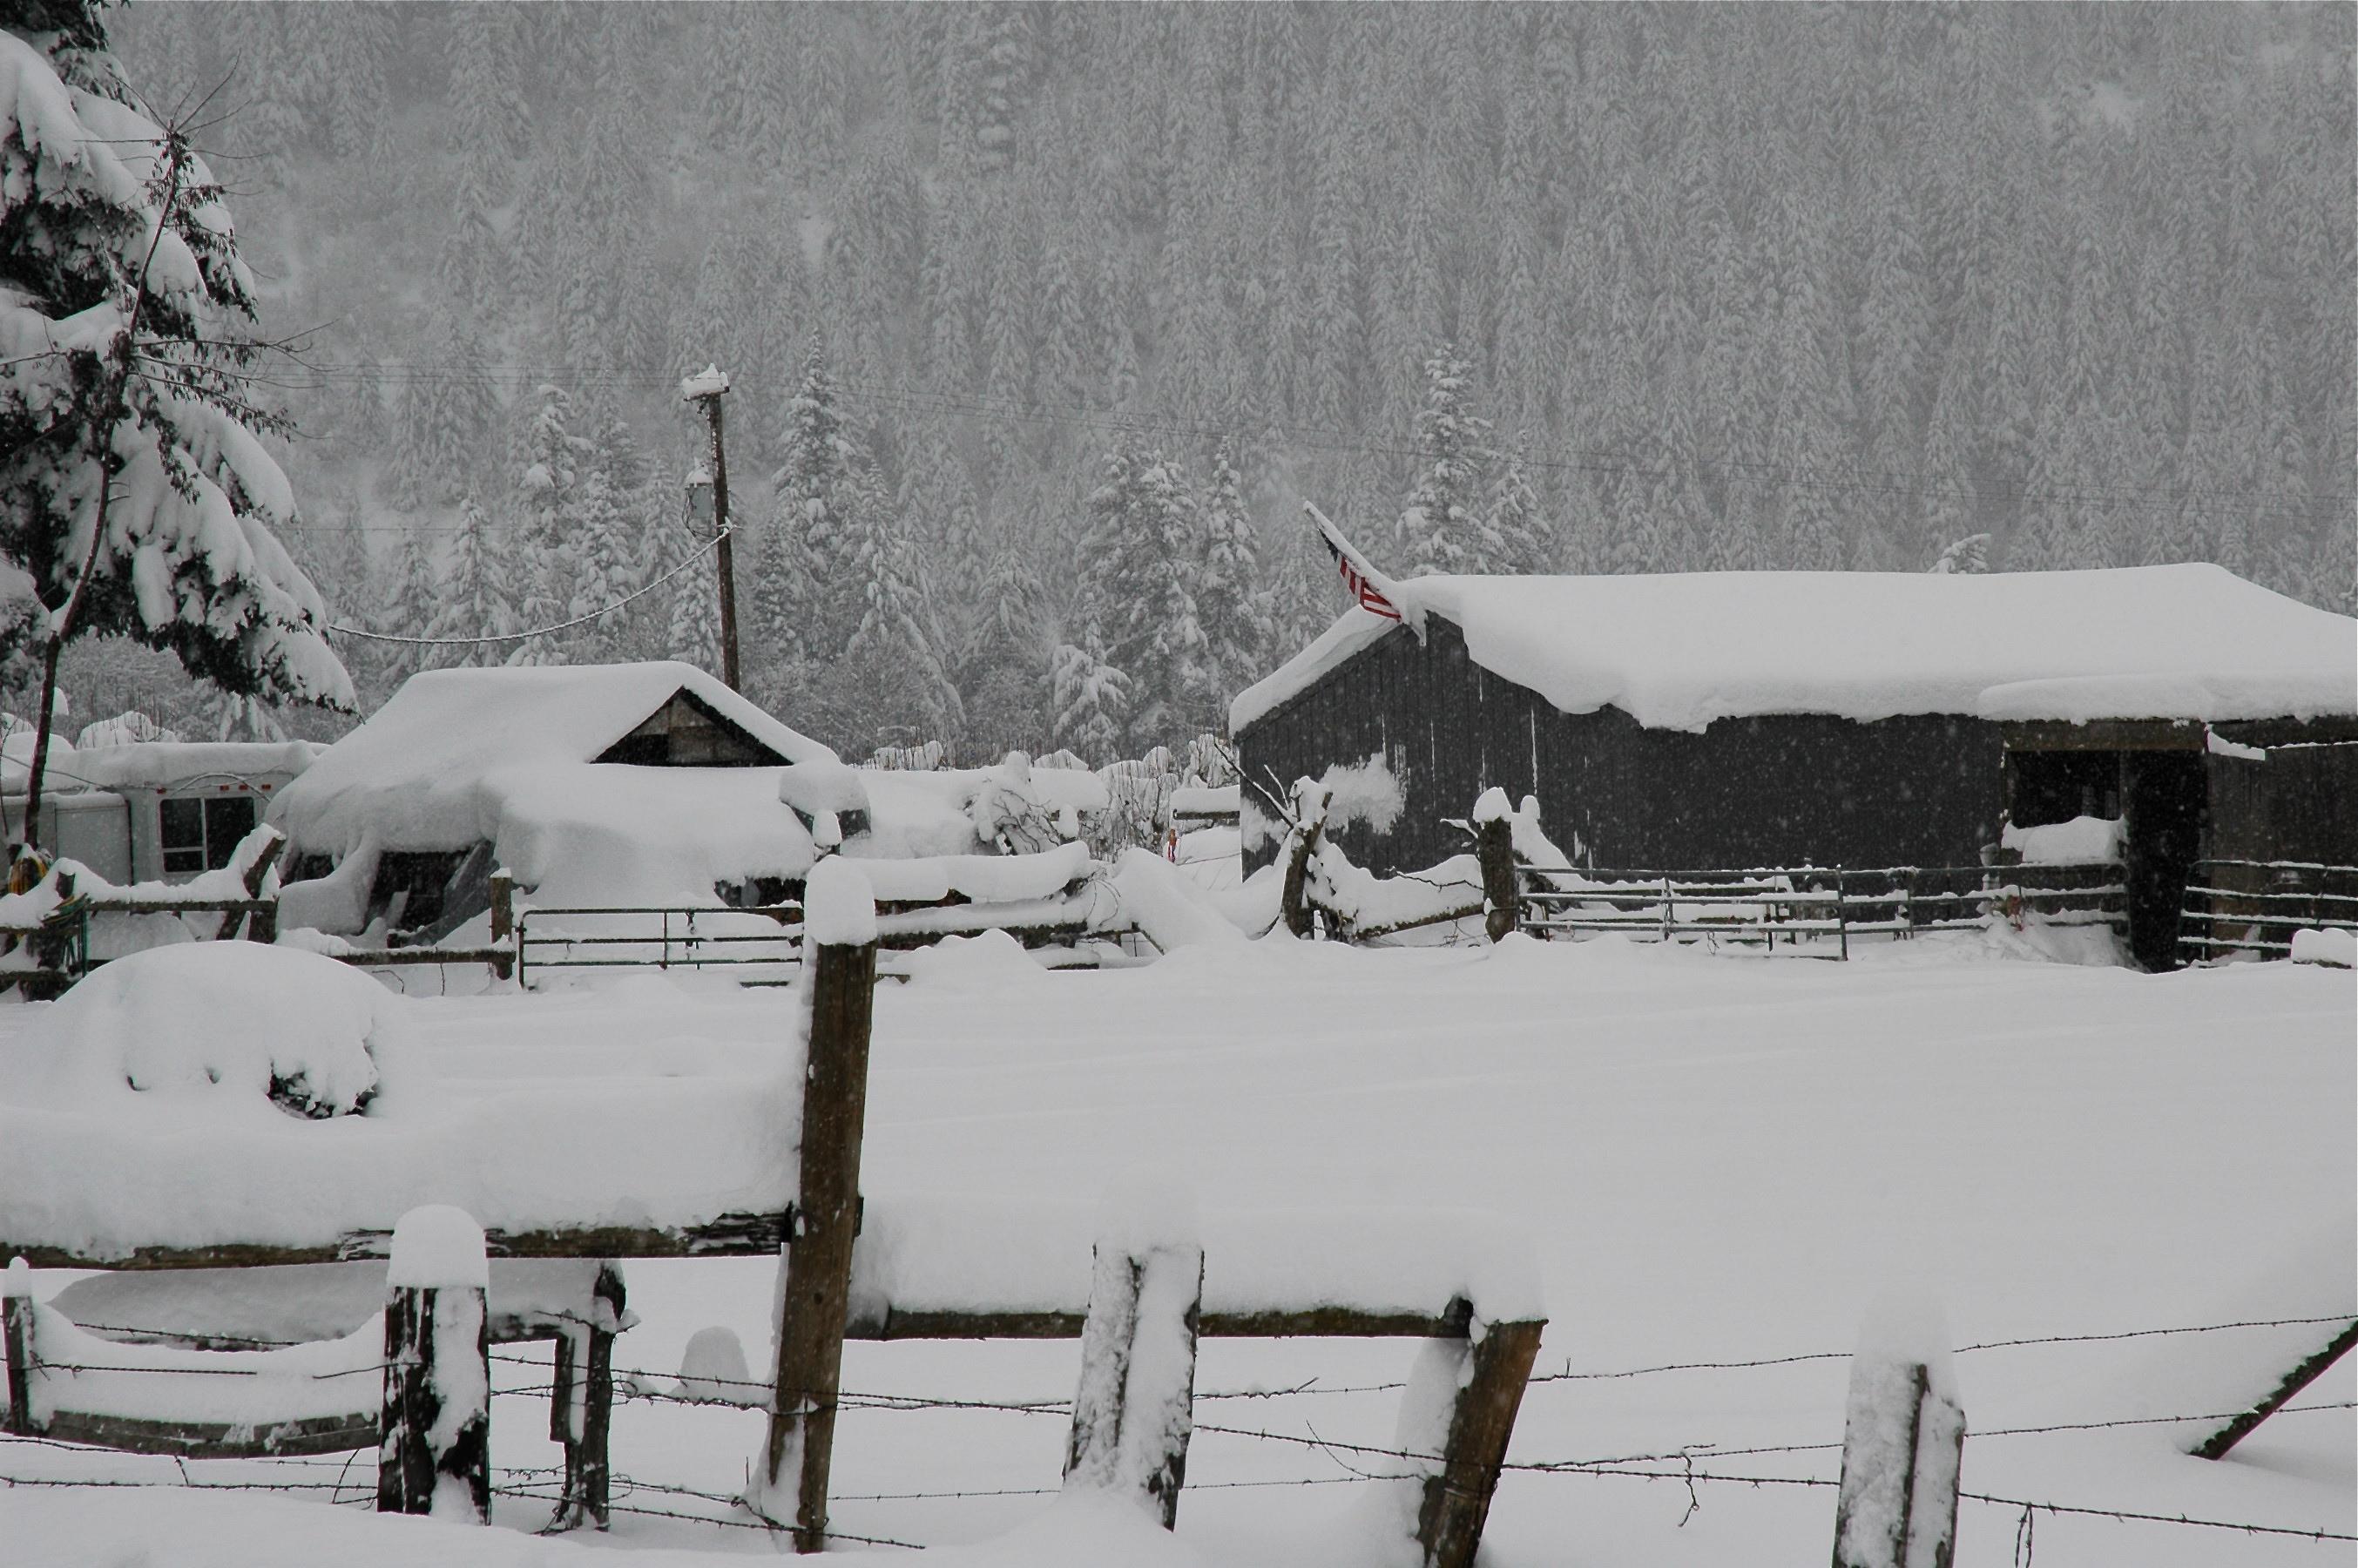 Lobo's snowy neighborhood